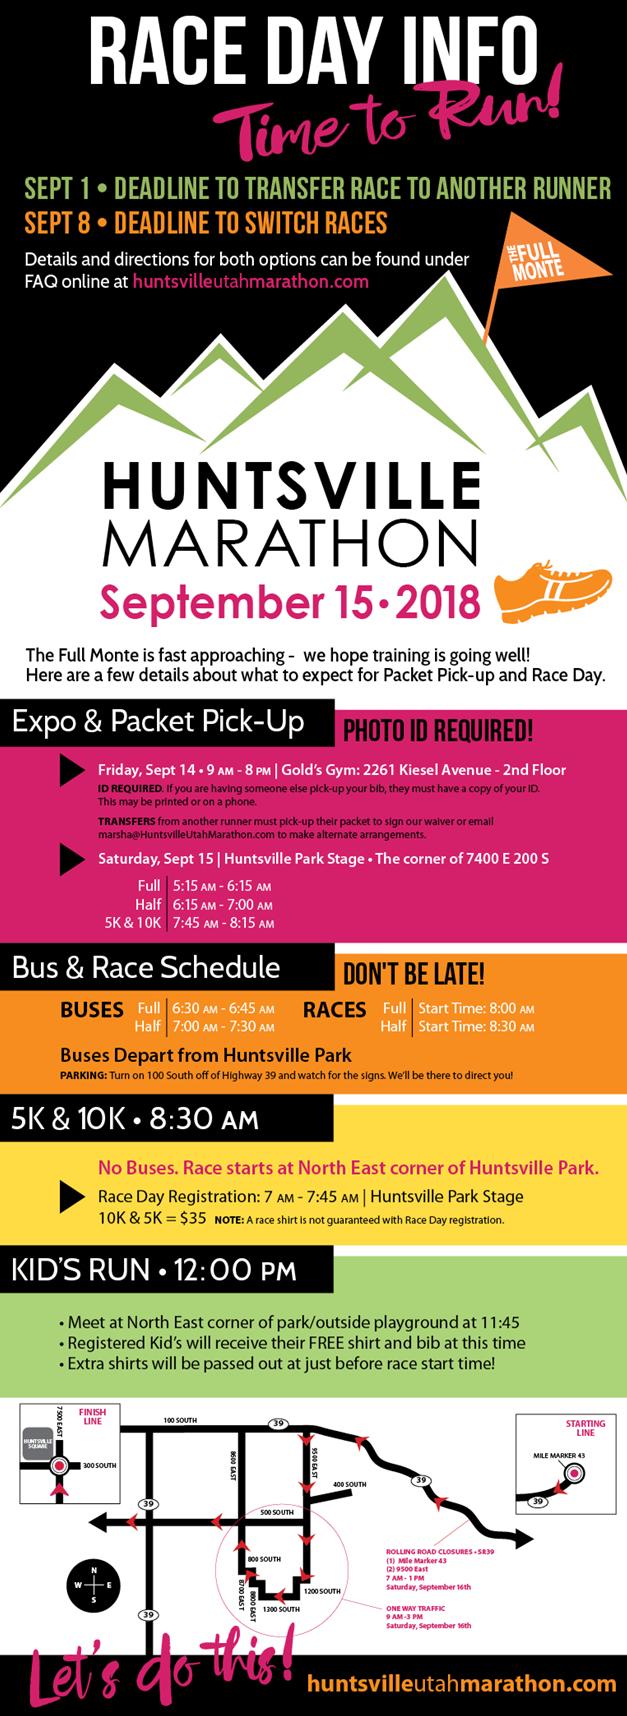 Huntsville Marathon Race Day Info 2018